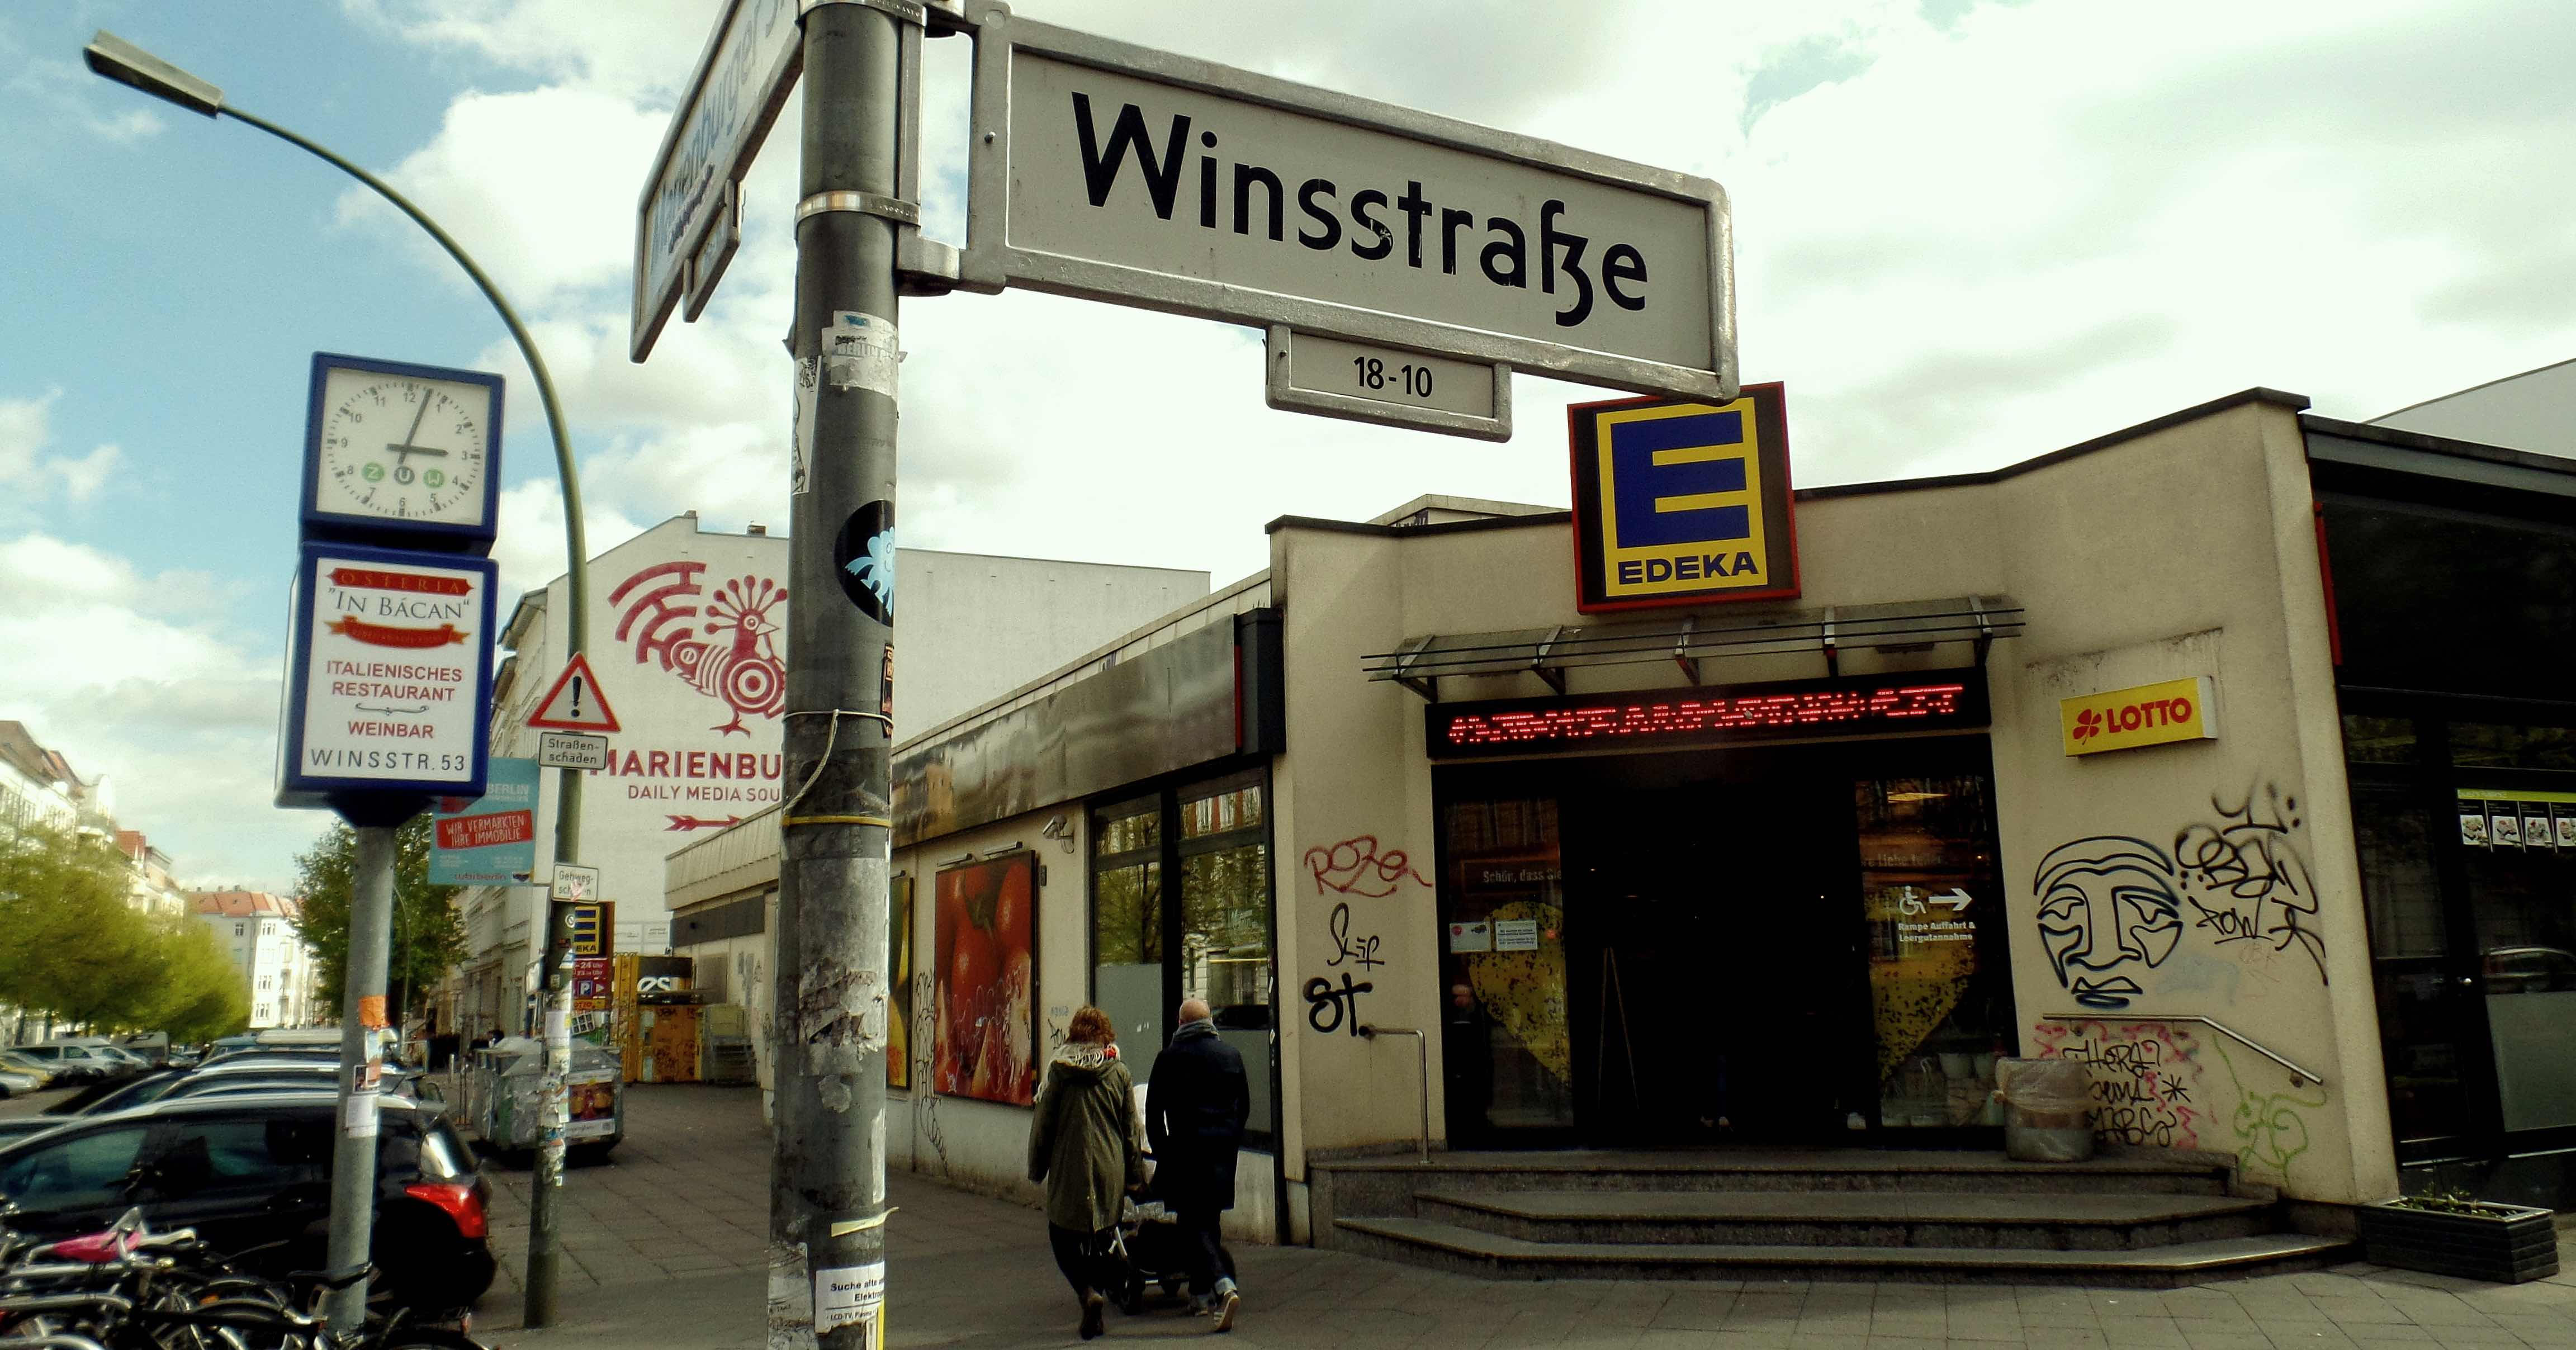 Edeka Winsstraße 18